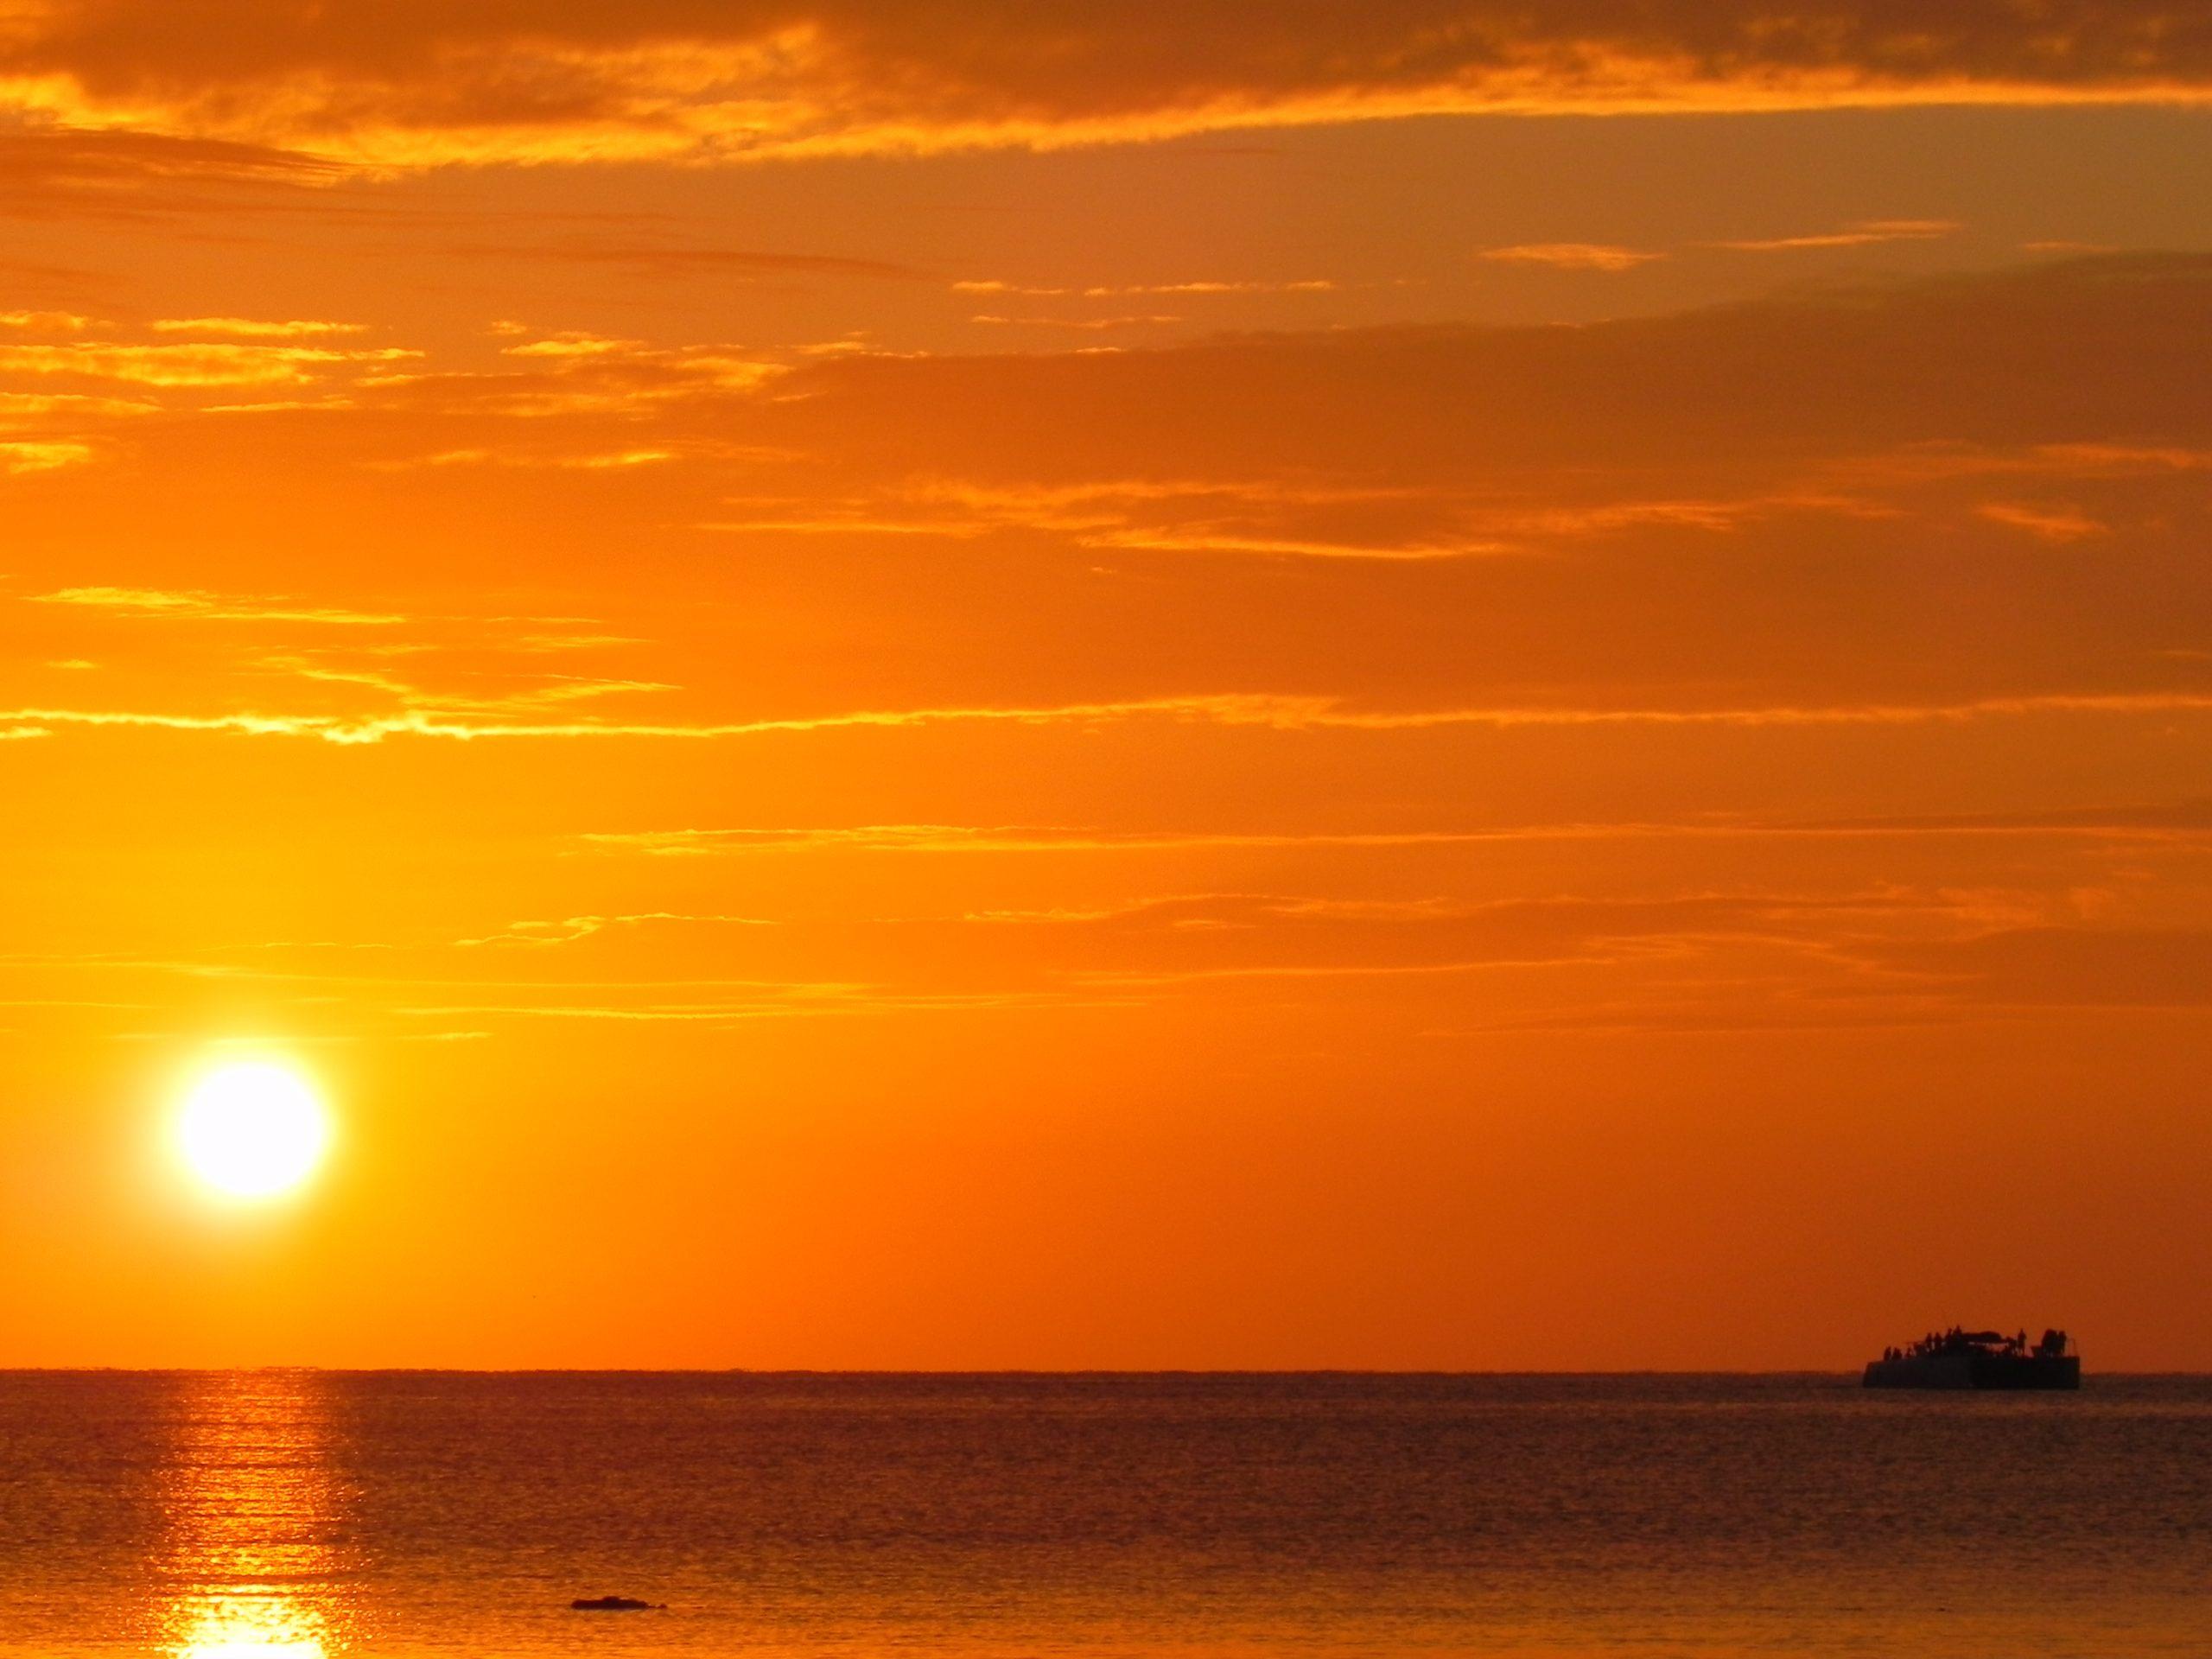 Sunset Cruise - Negril, Jamaica